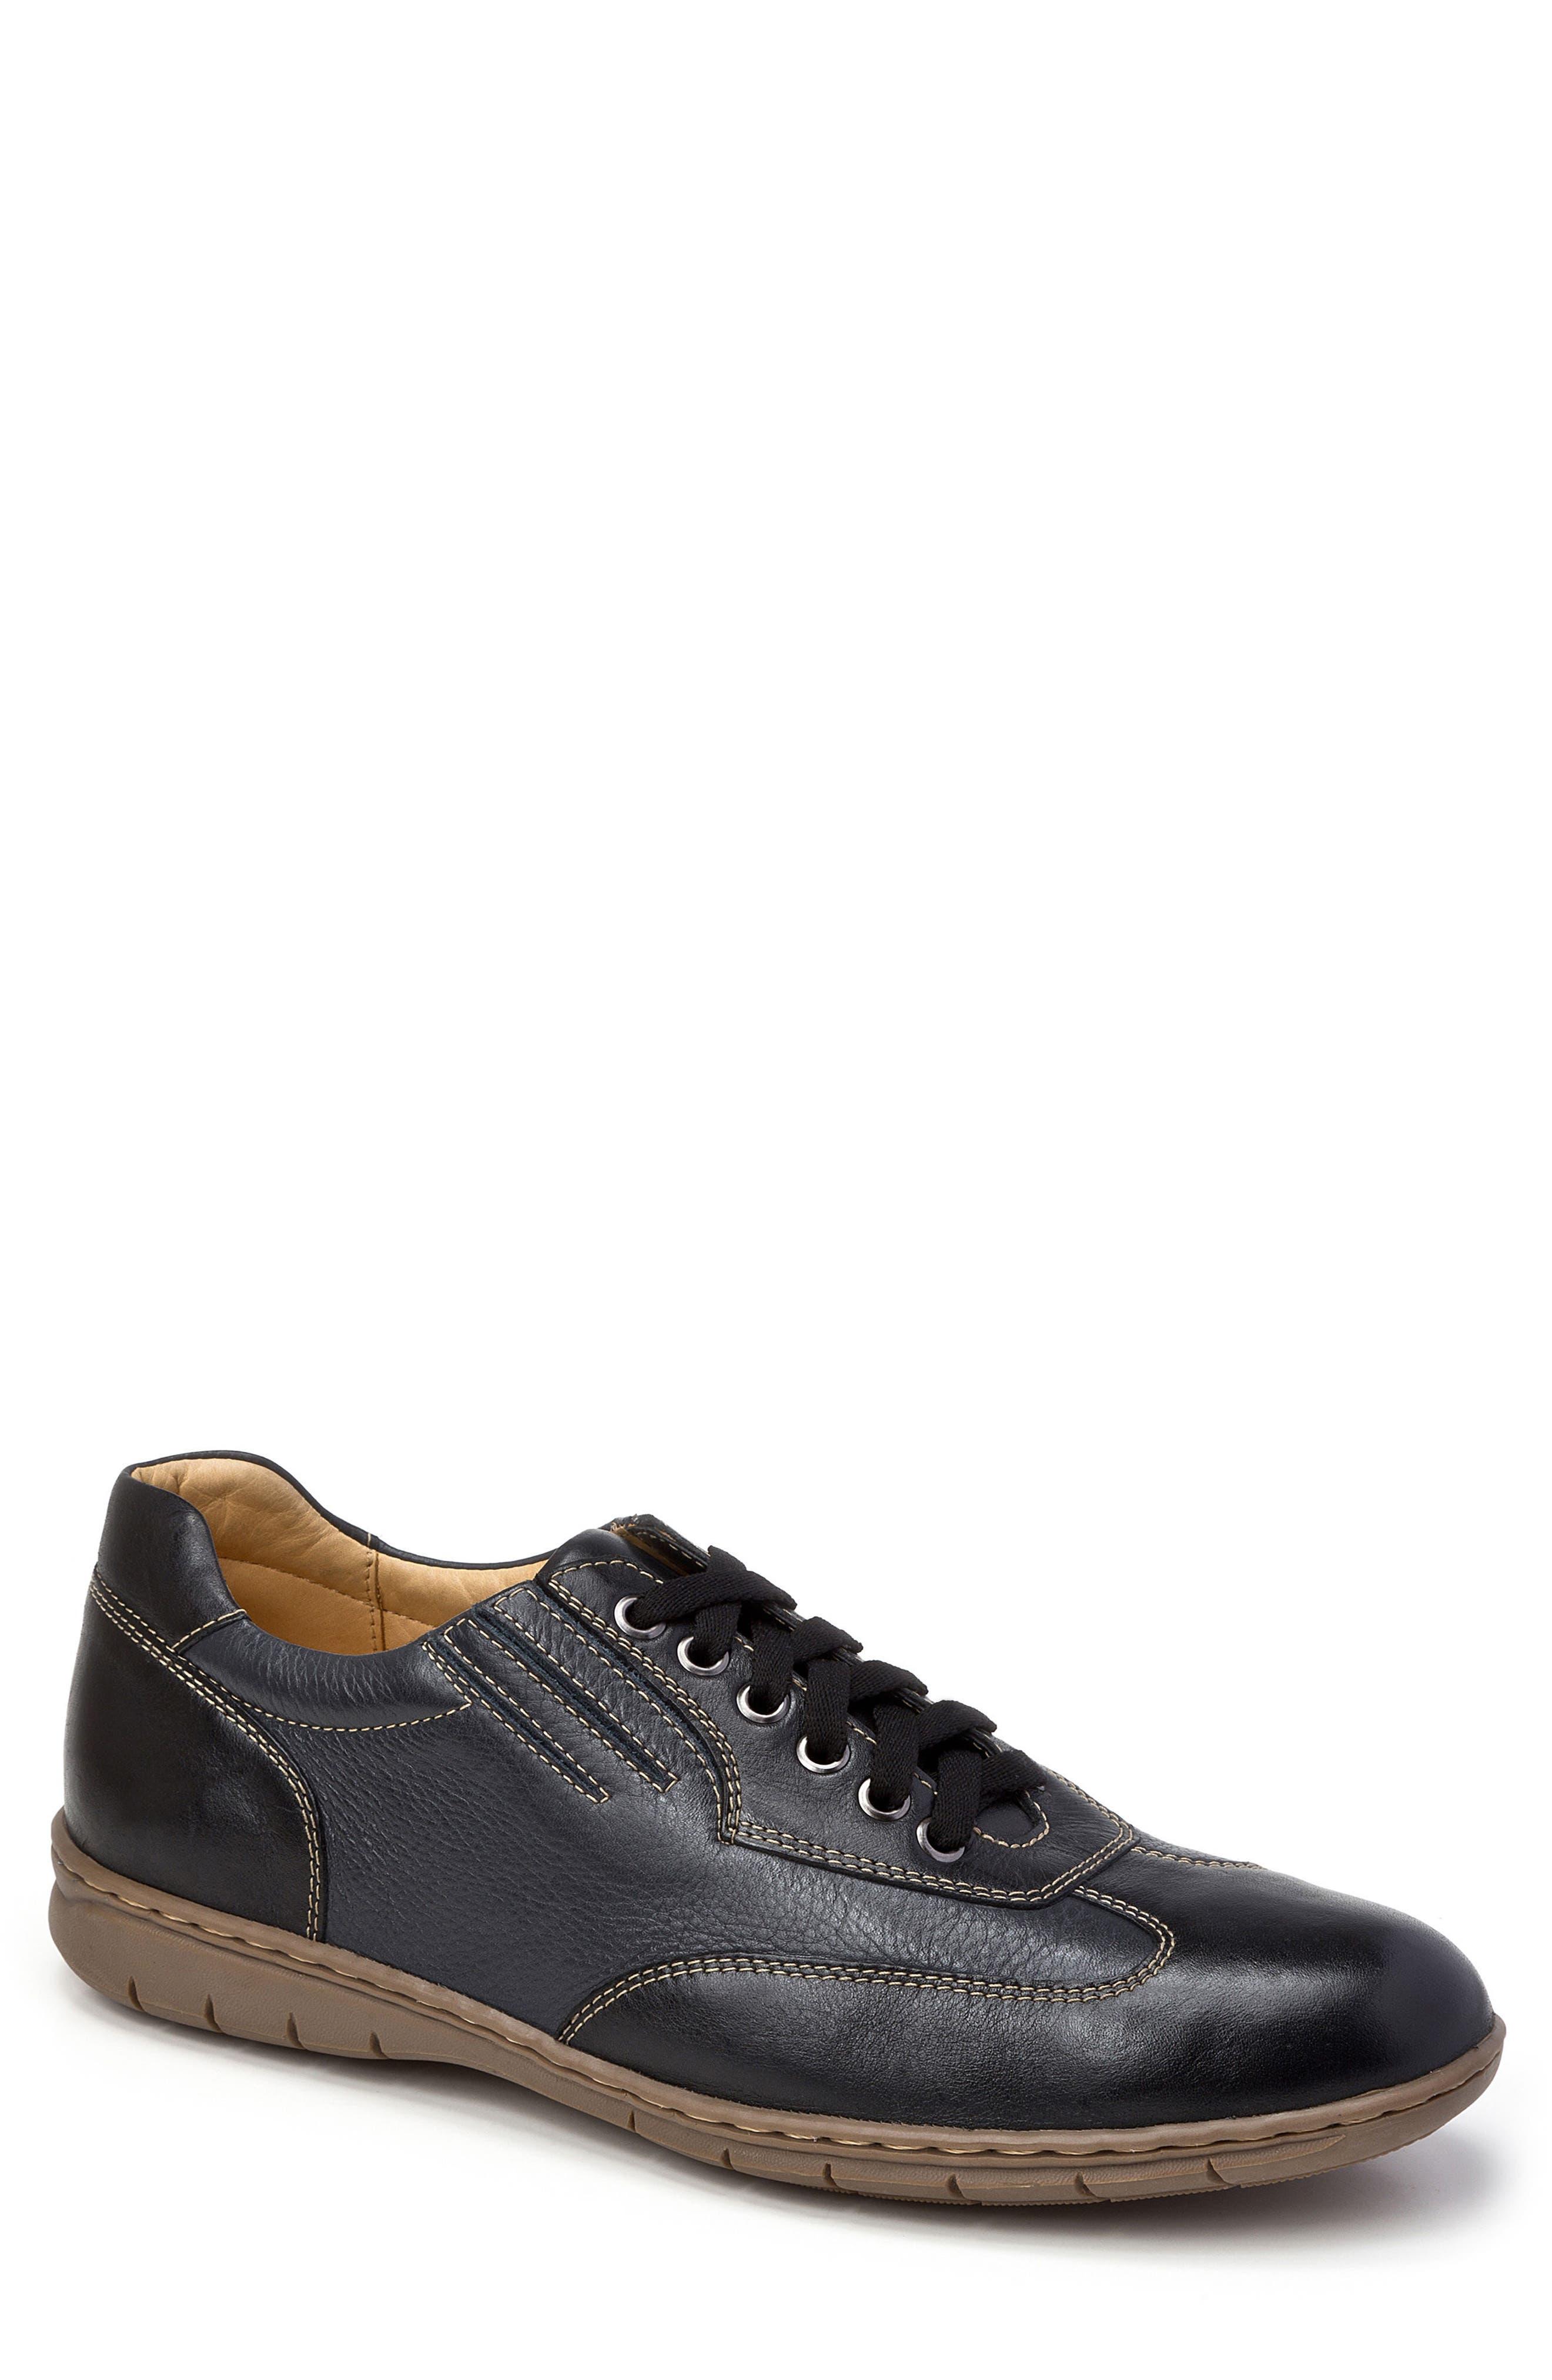 Vernon Sneaker,                             Main thumbnail 1, color,                             Black Leather